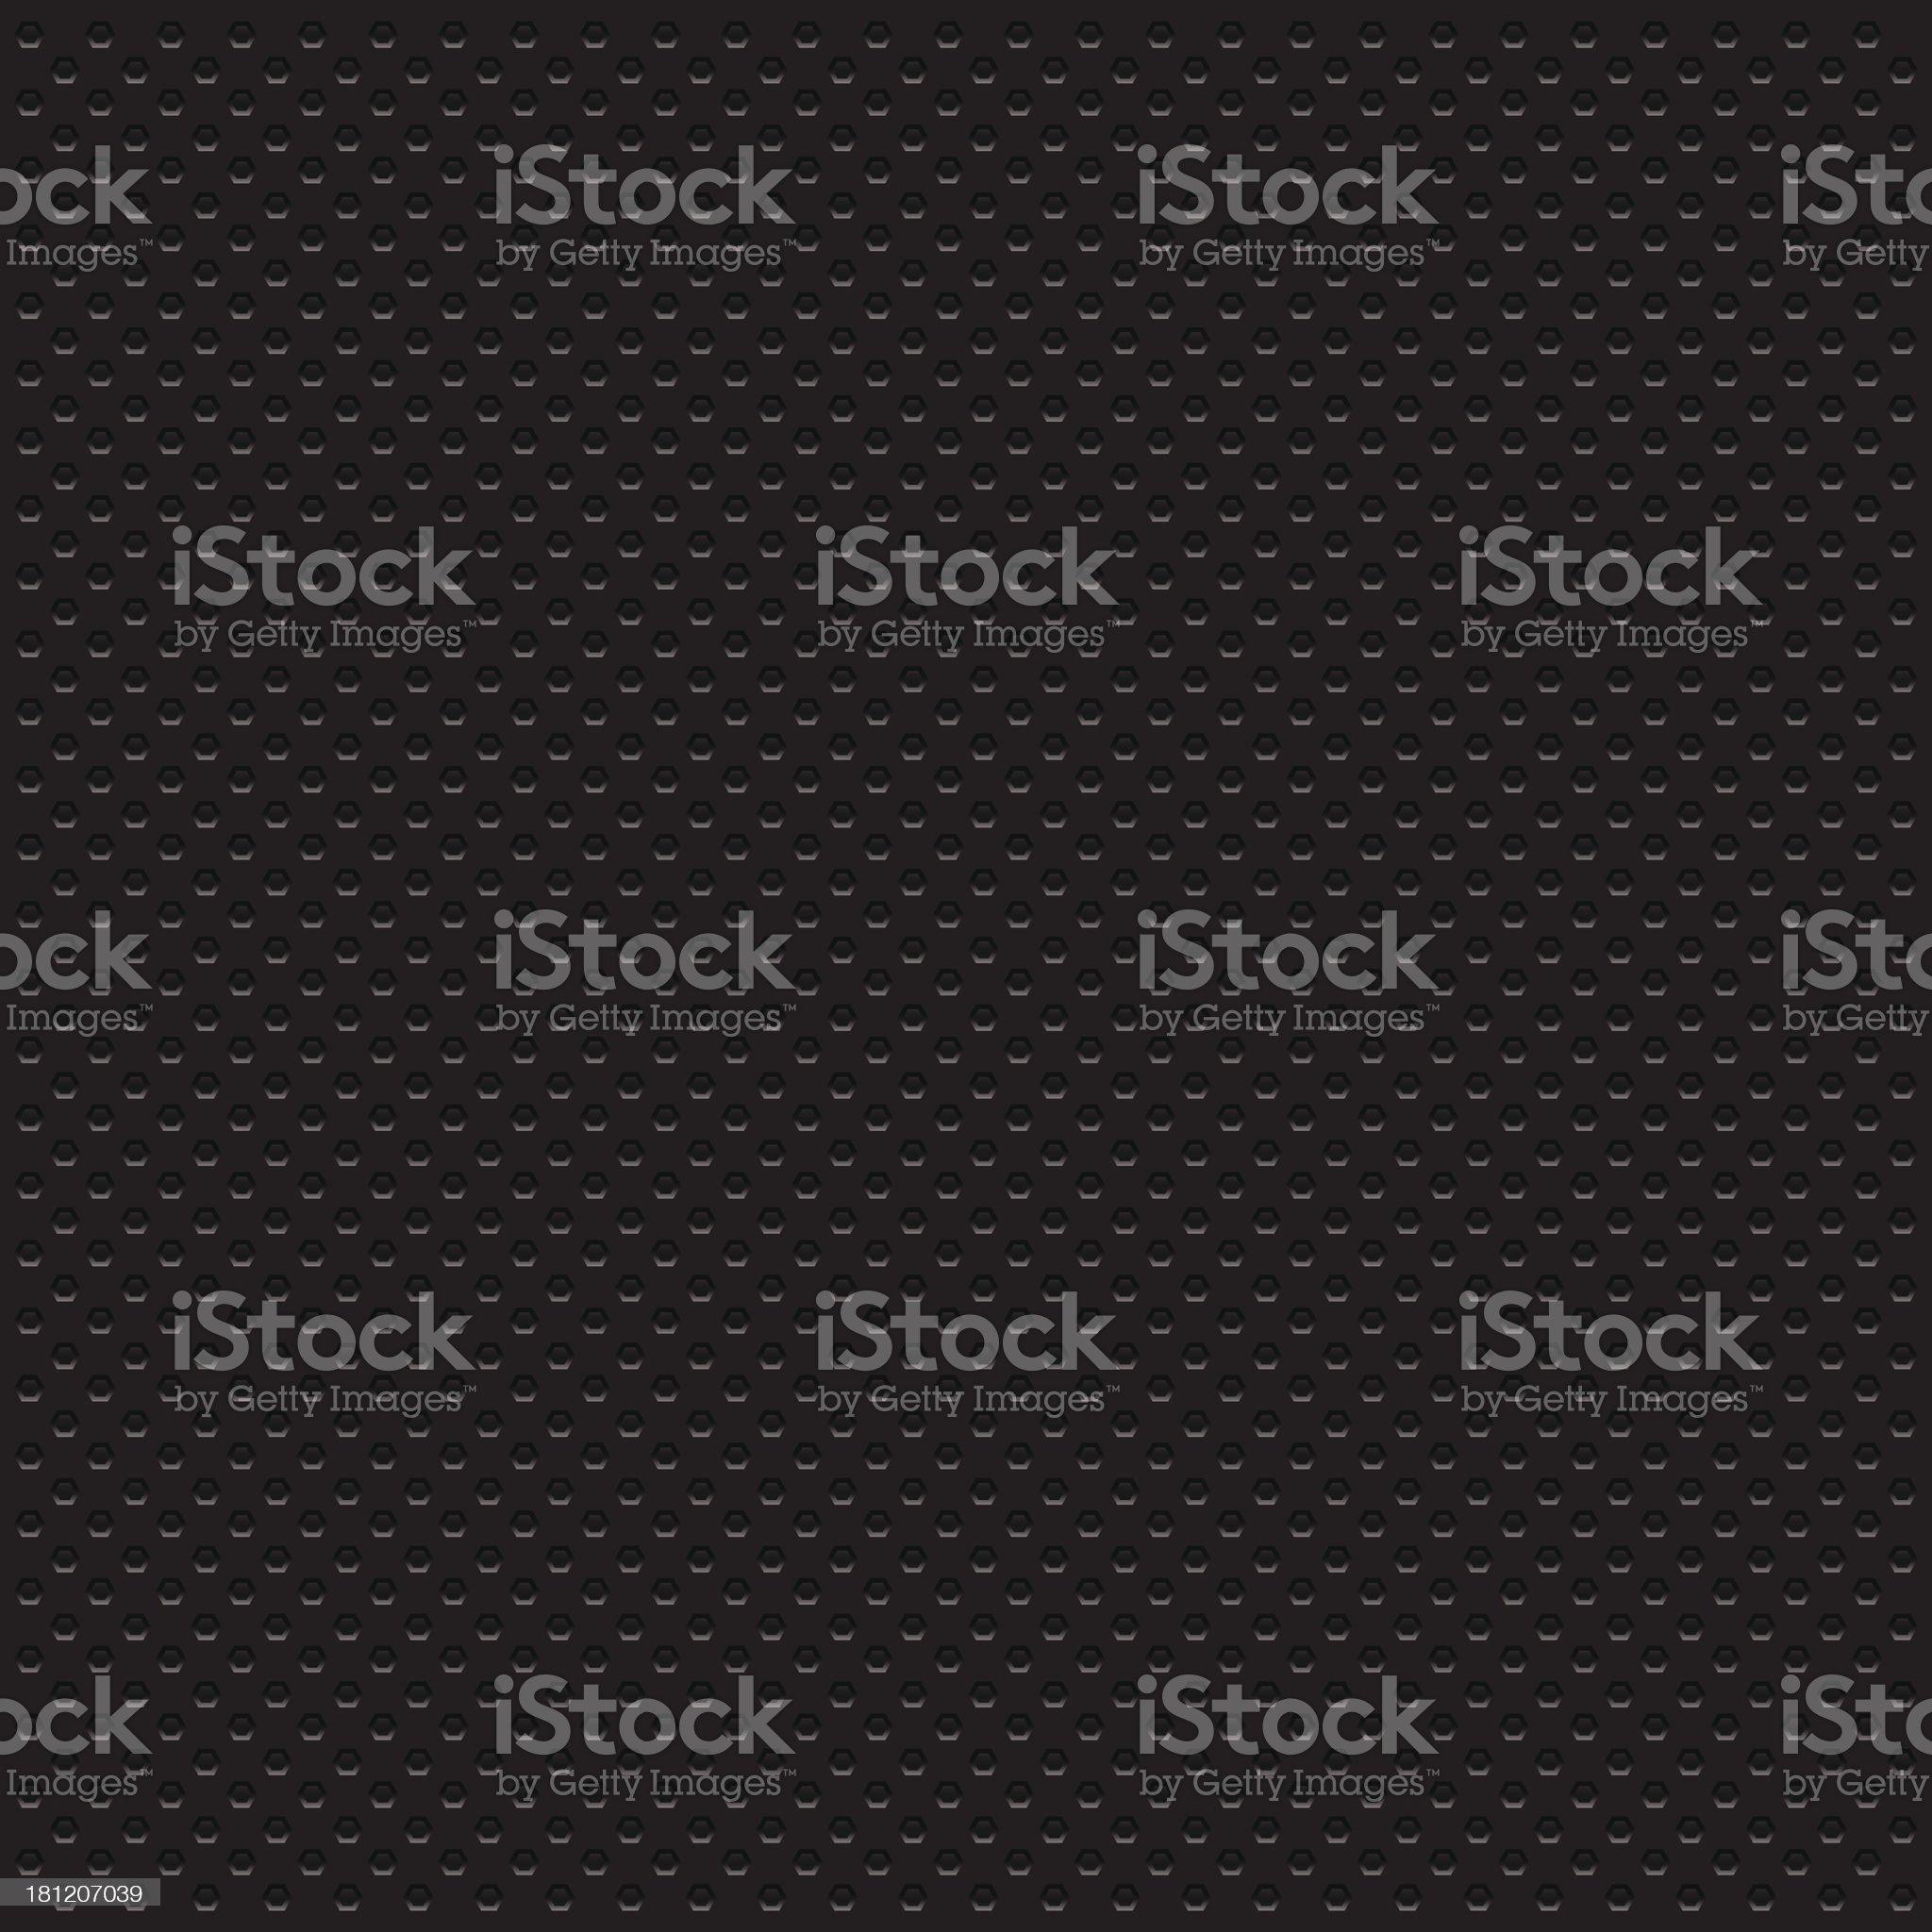 Hexagon perforated metal texture - VECTOR royalty-free stock vector art